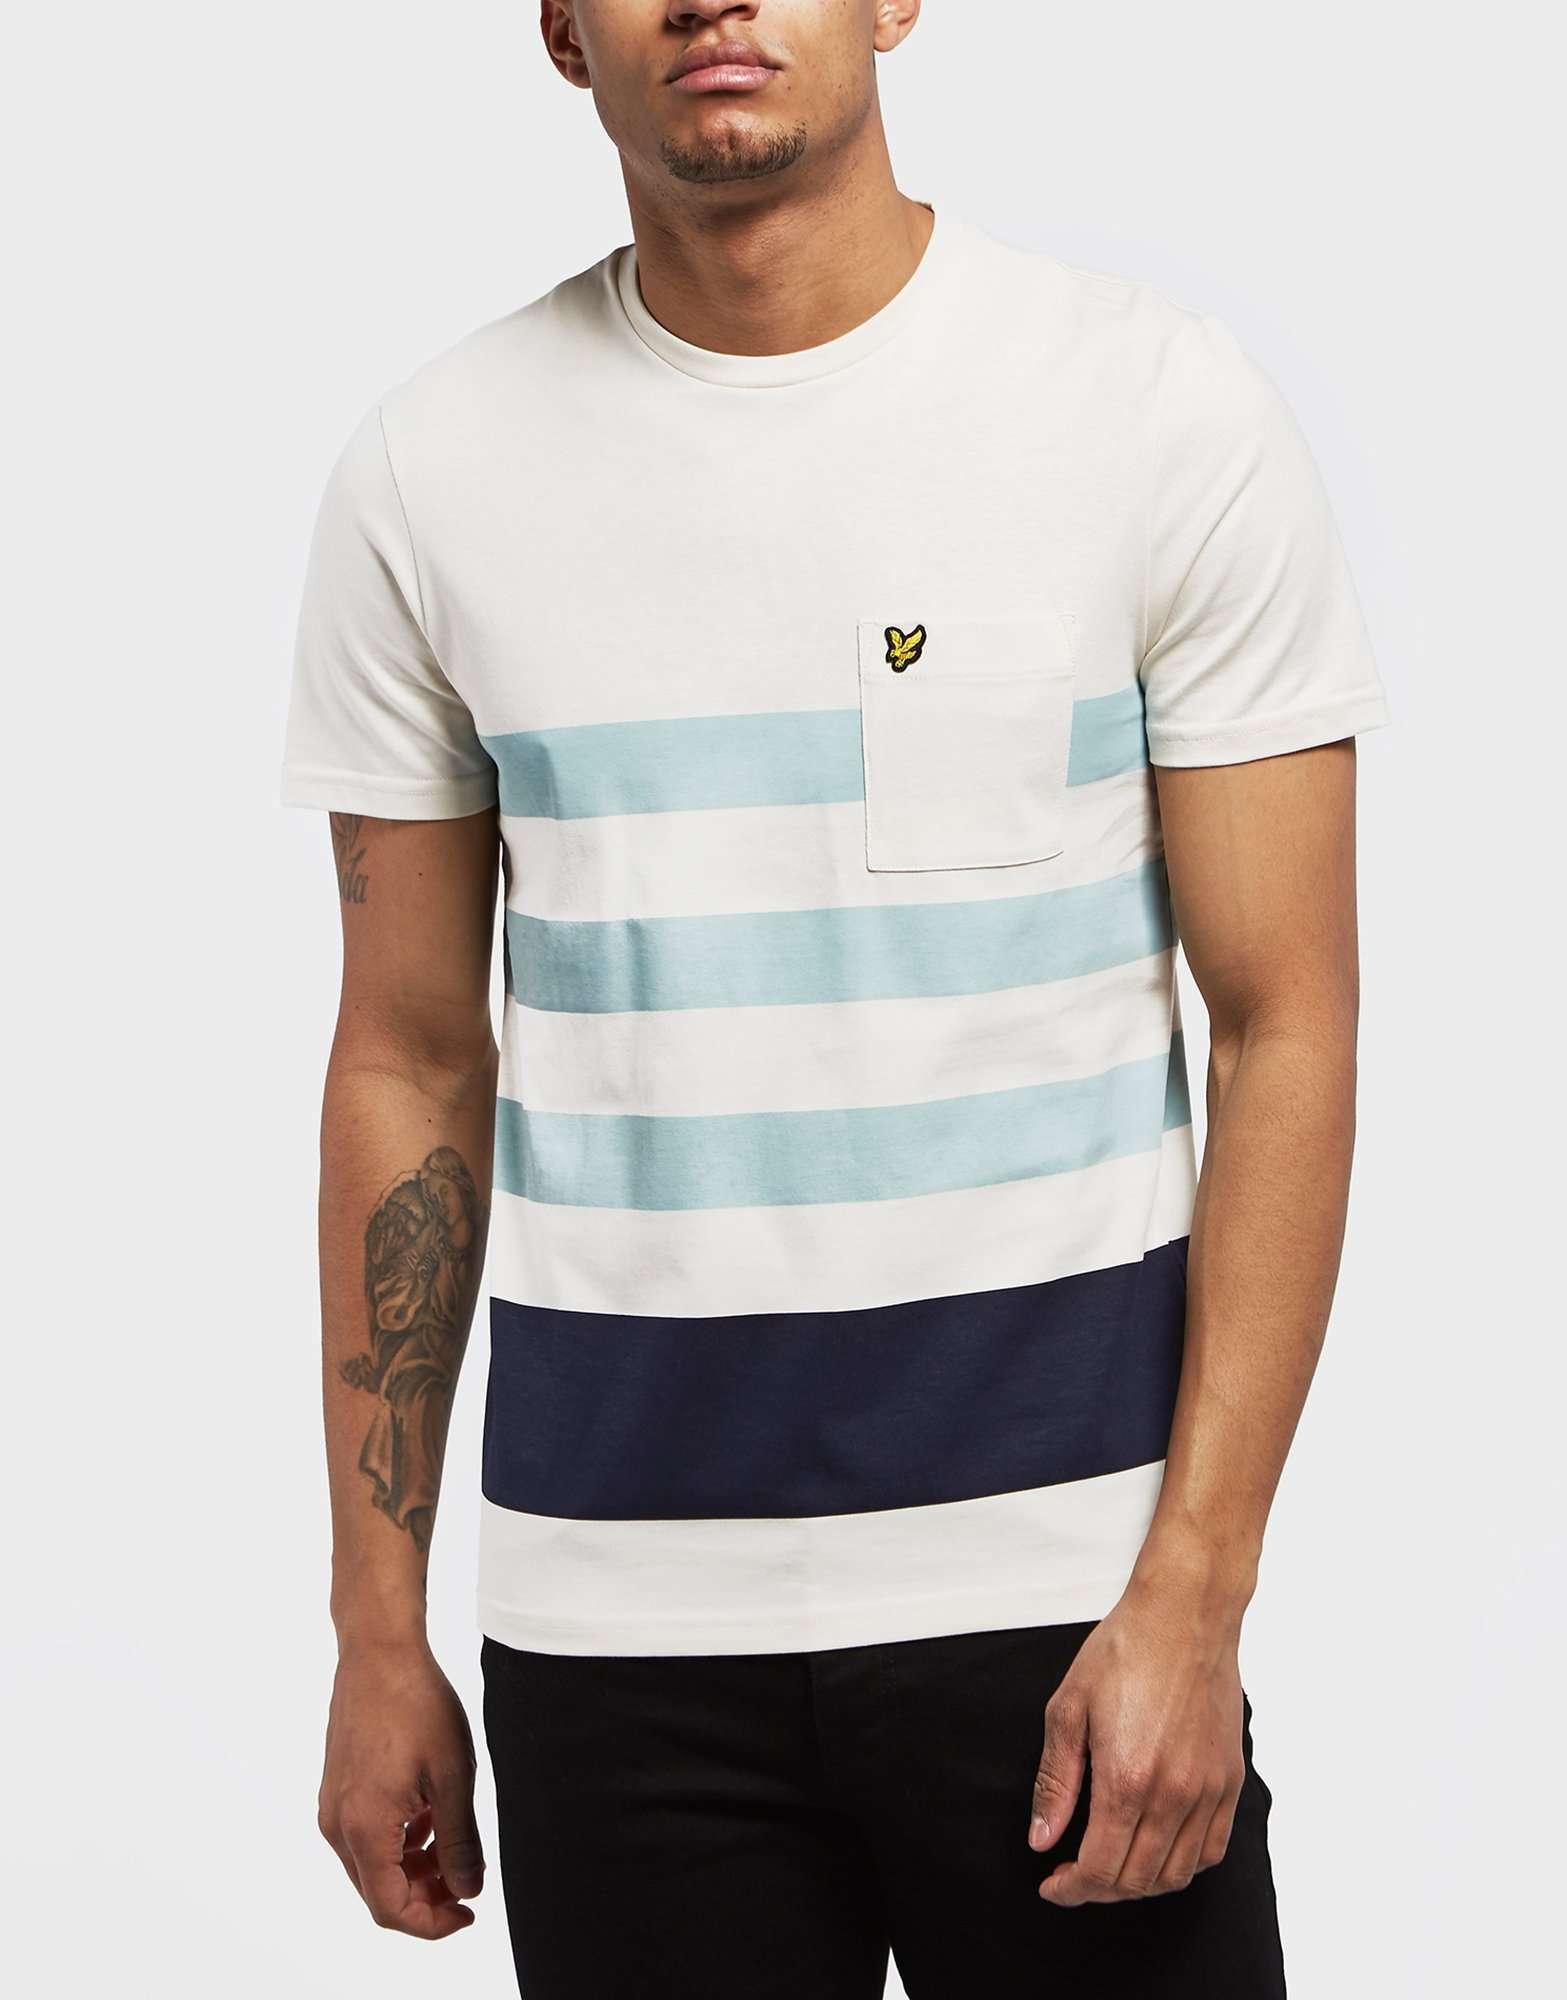 Lyle & Scott Short Sleeve Pocket T-Shirt